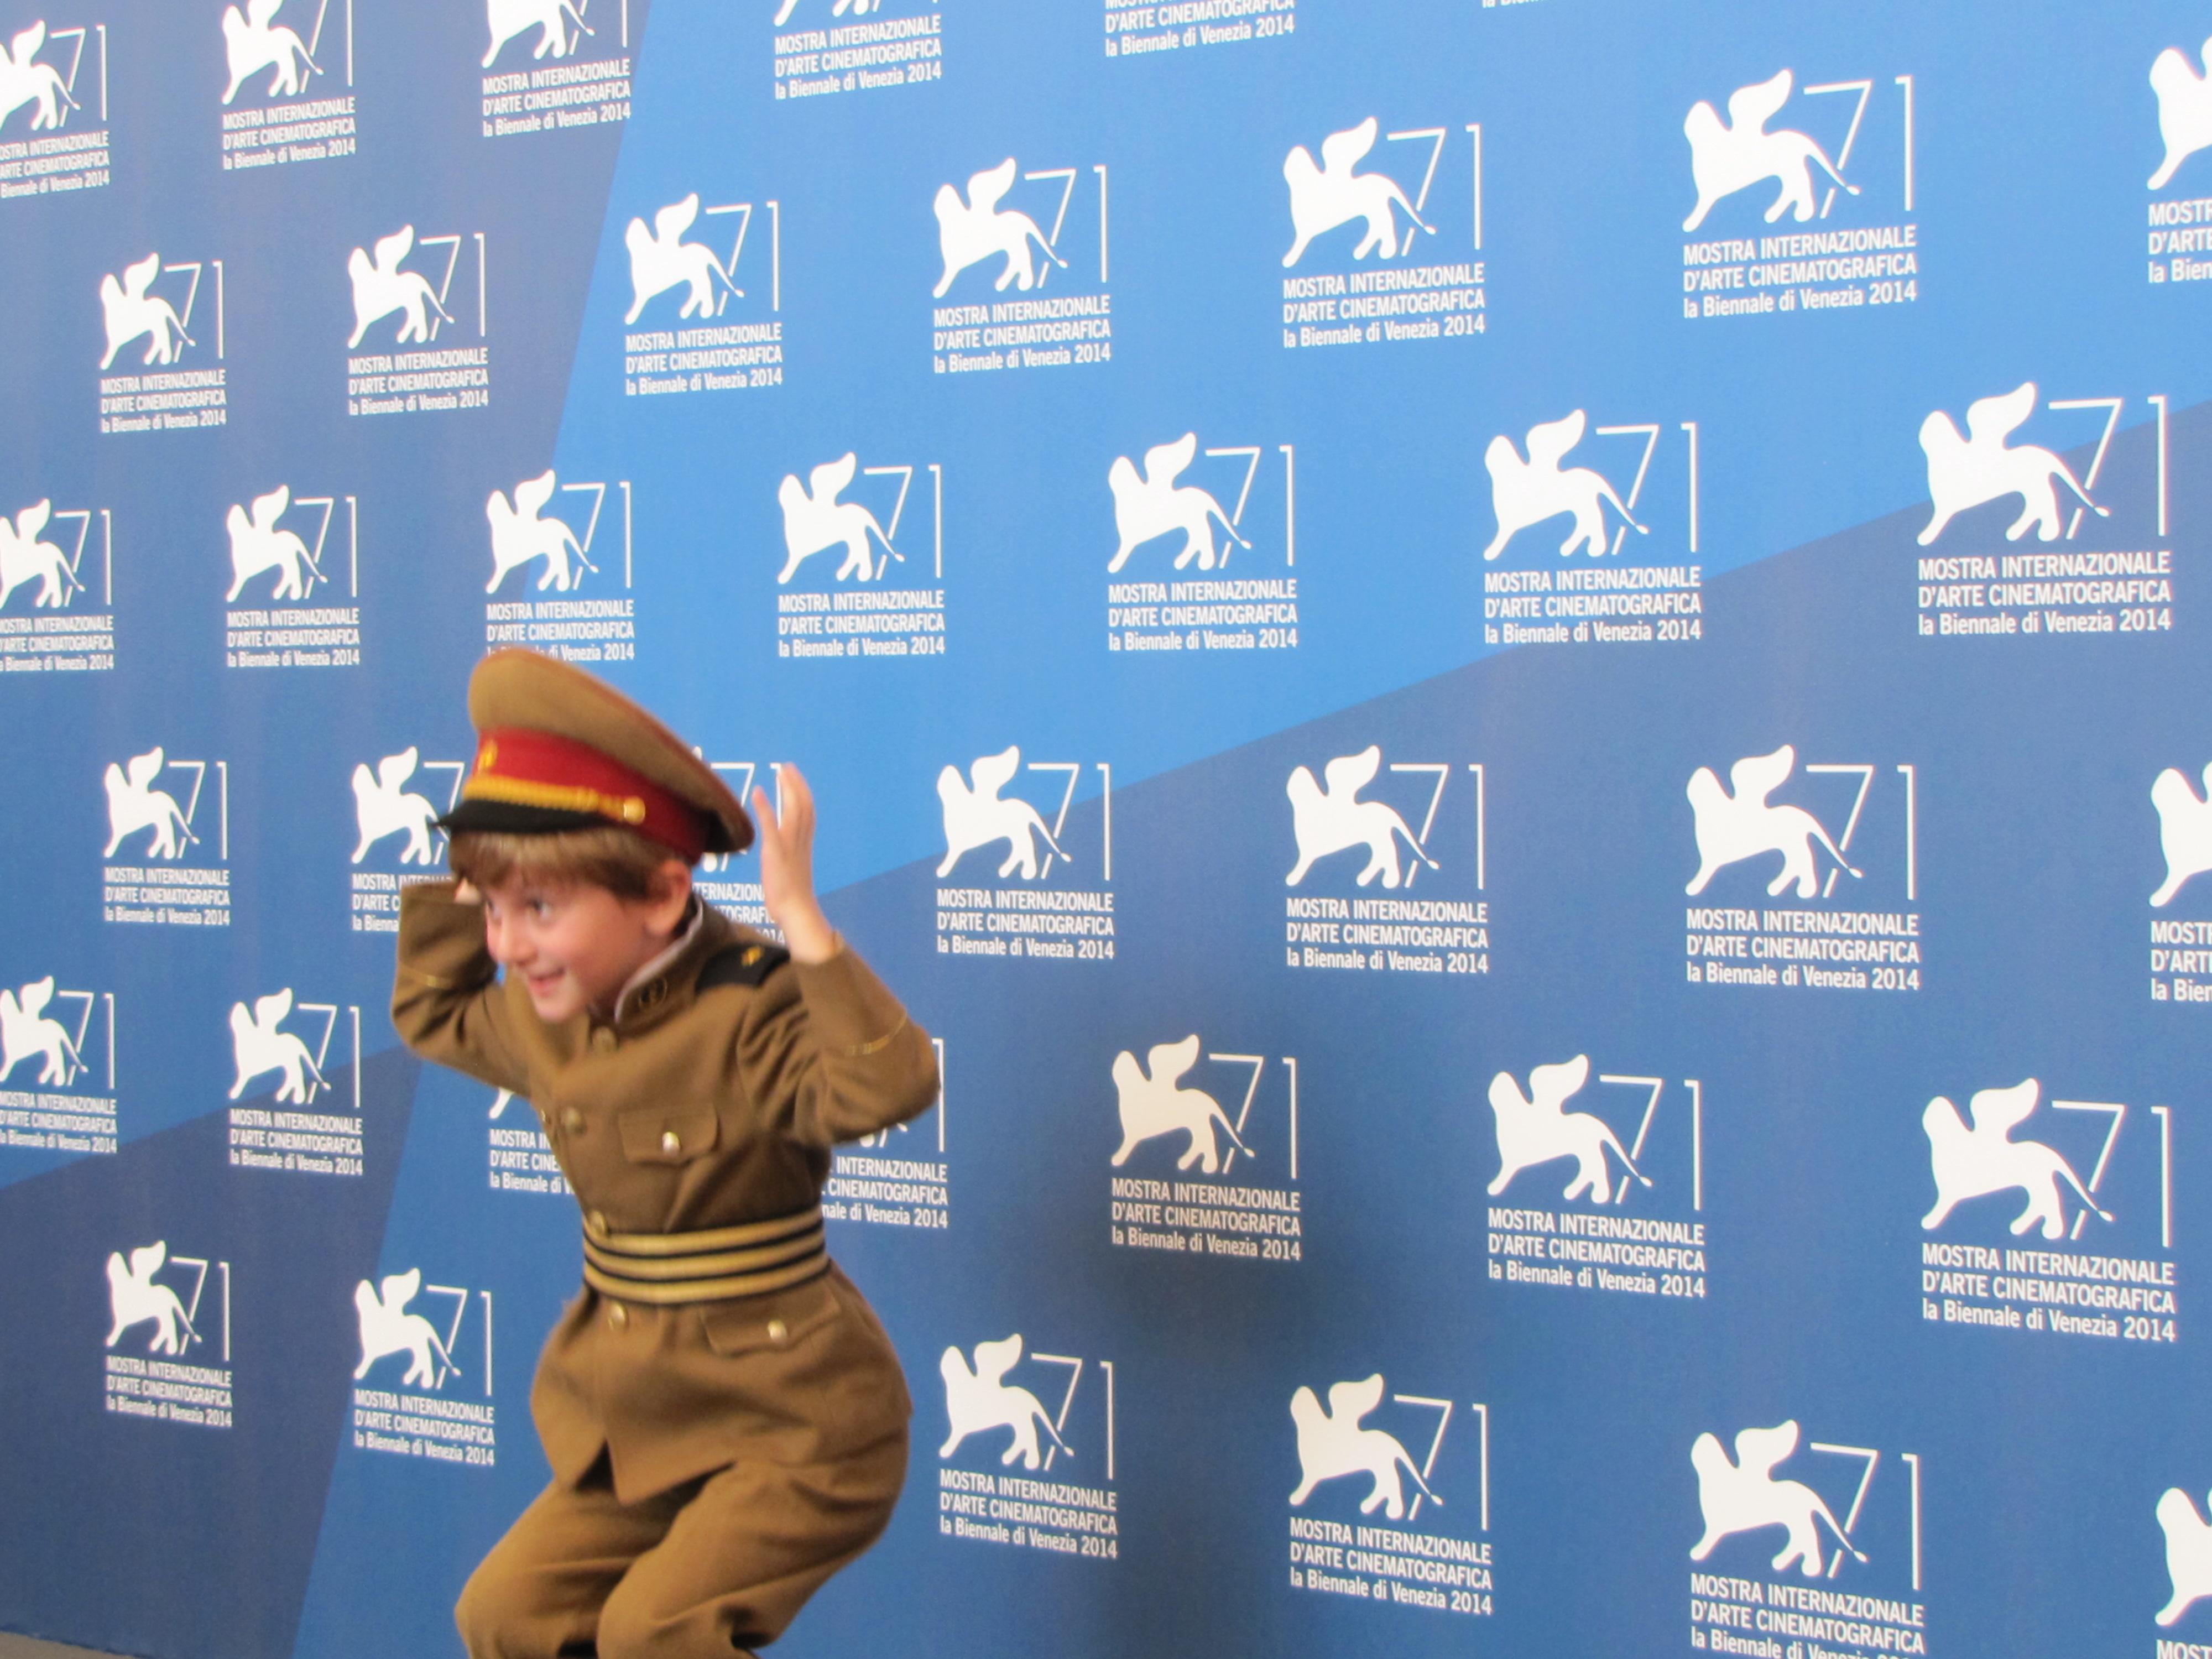 The President a Venezia 2014 - il piccolo Dachi Orvelashvili vestito da 'dittatore'